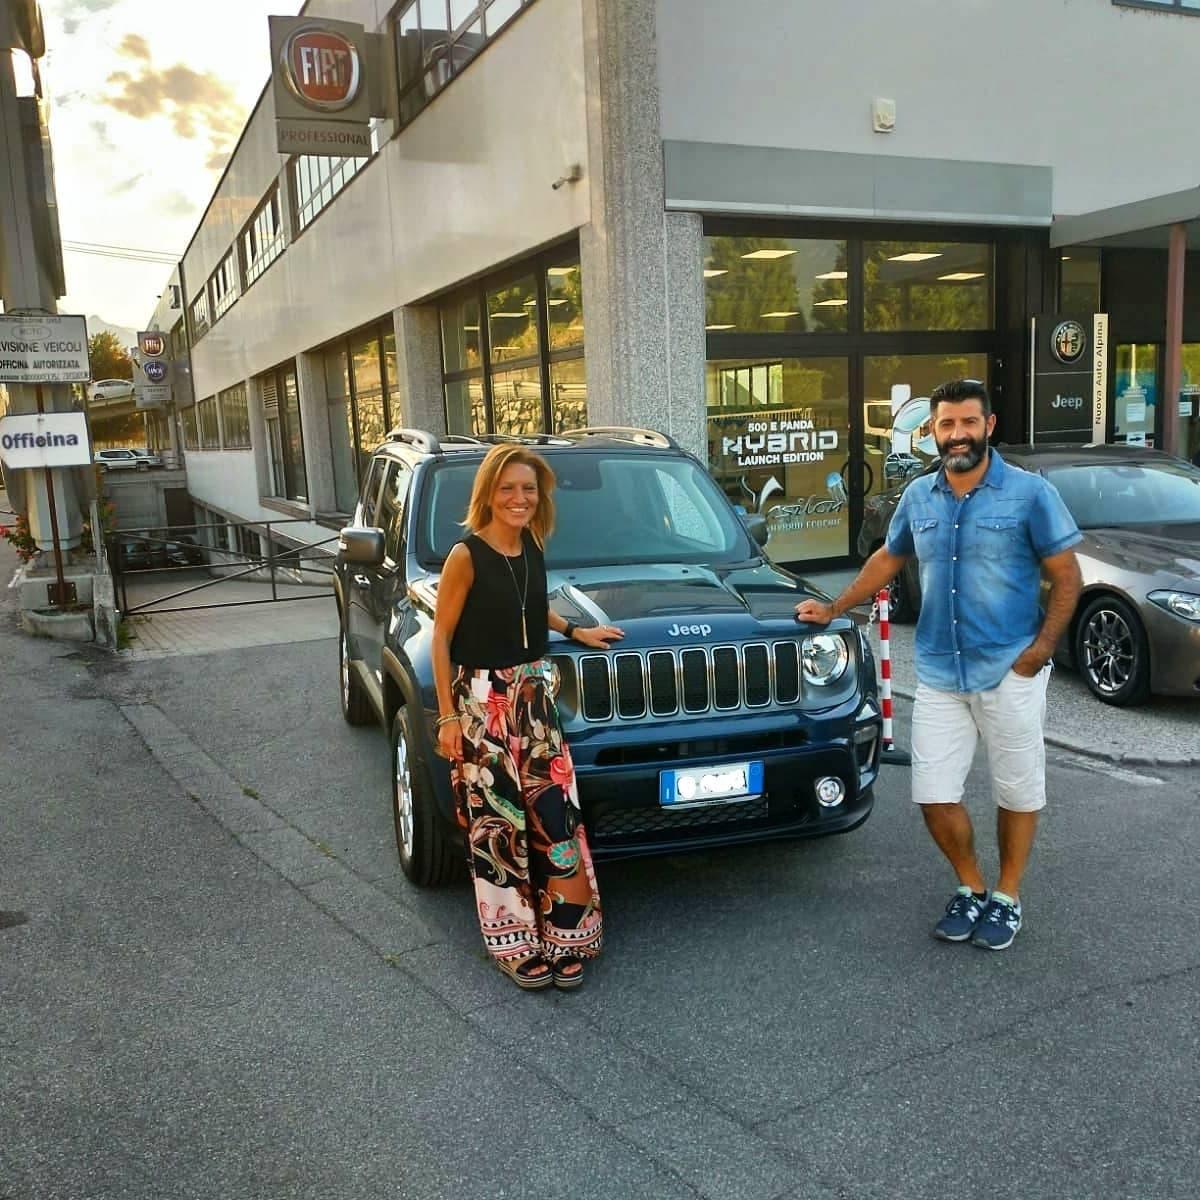 Jeep Renegade 4xe Italia